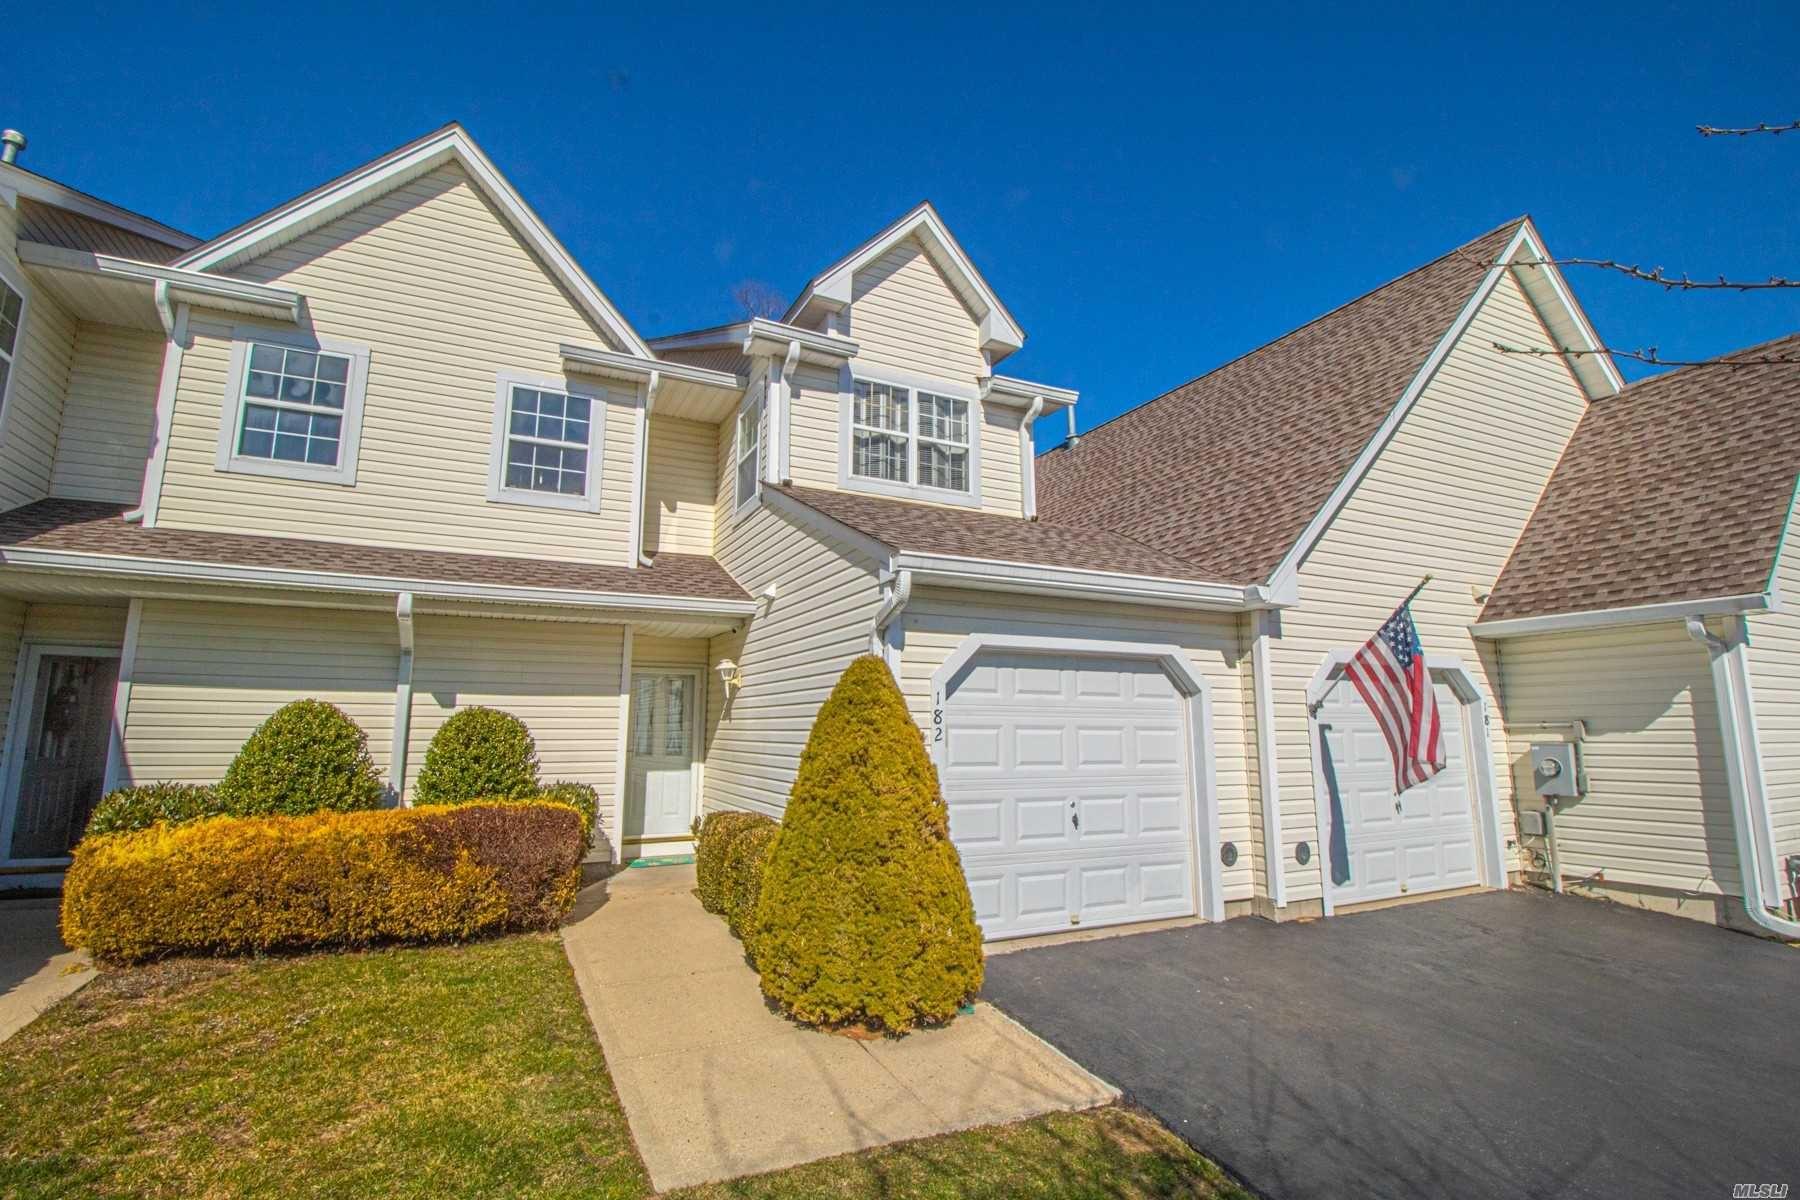 182 Erik Drive, East Setauket, NY 11733 - MLS#: 3214451